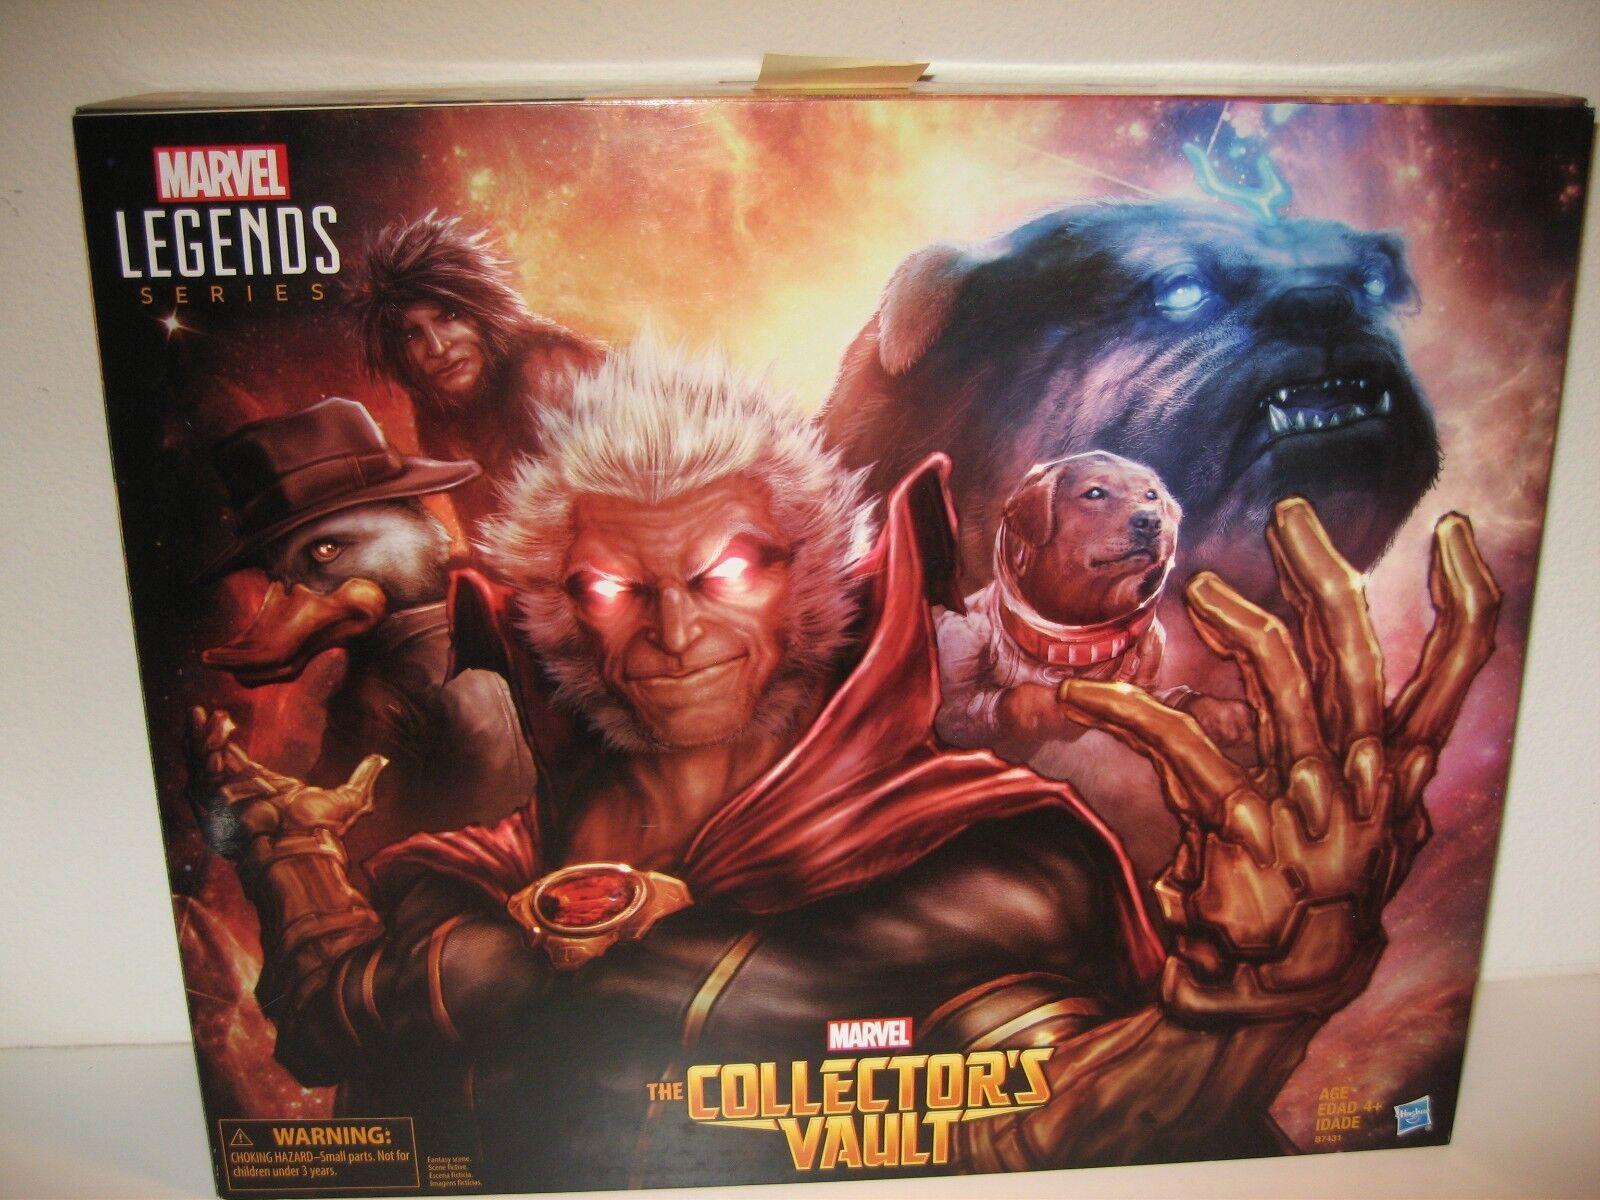 Marvel Marvel Marvel Legends The Collectors Vault Figure Set - Brand New 819fdb